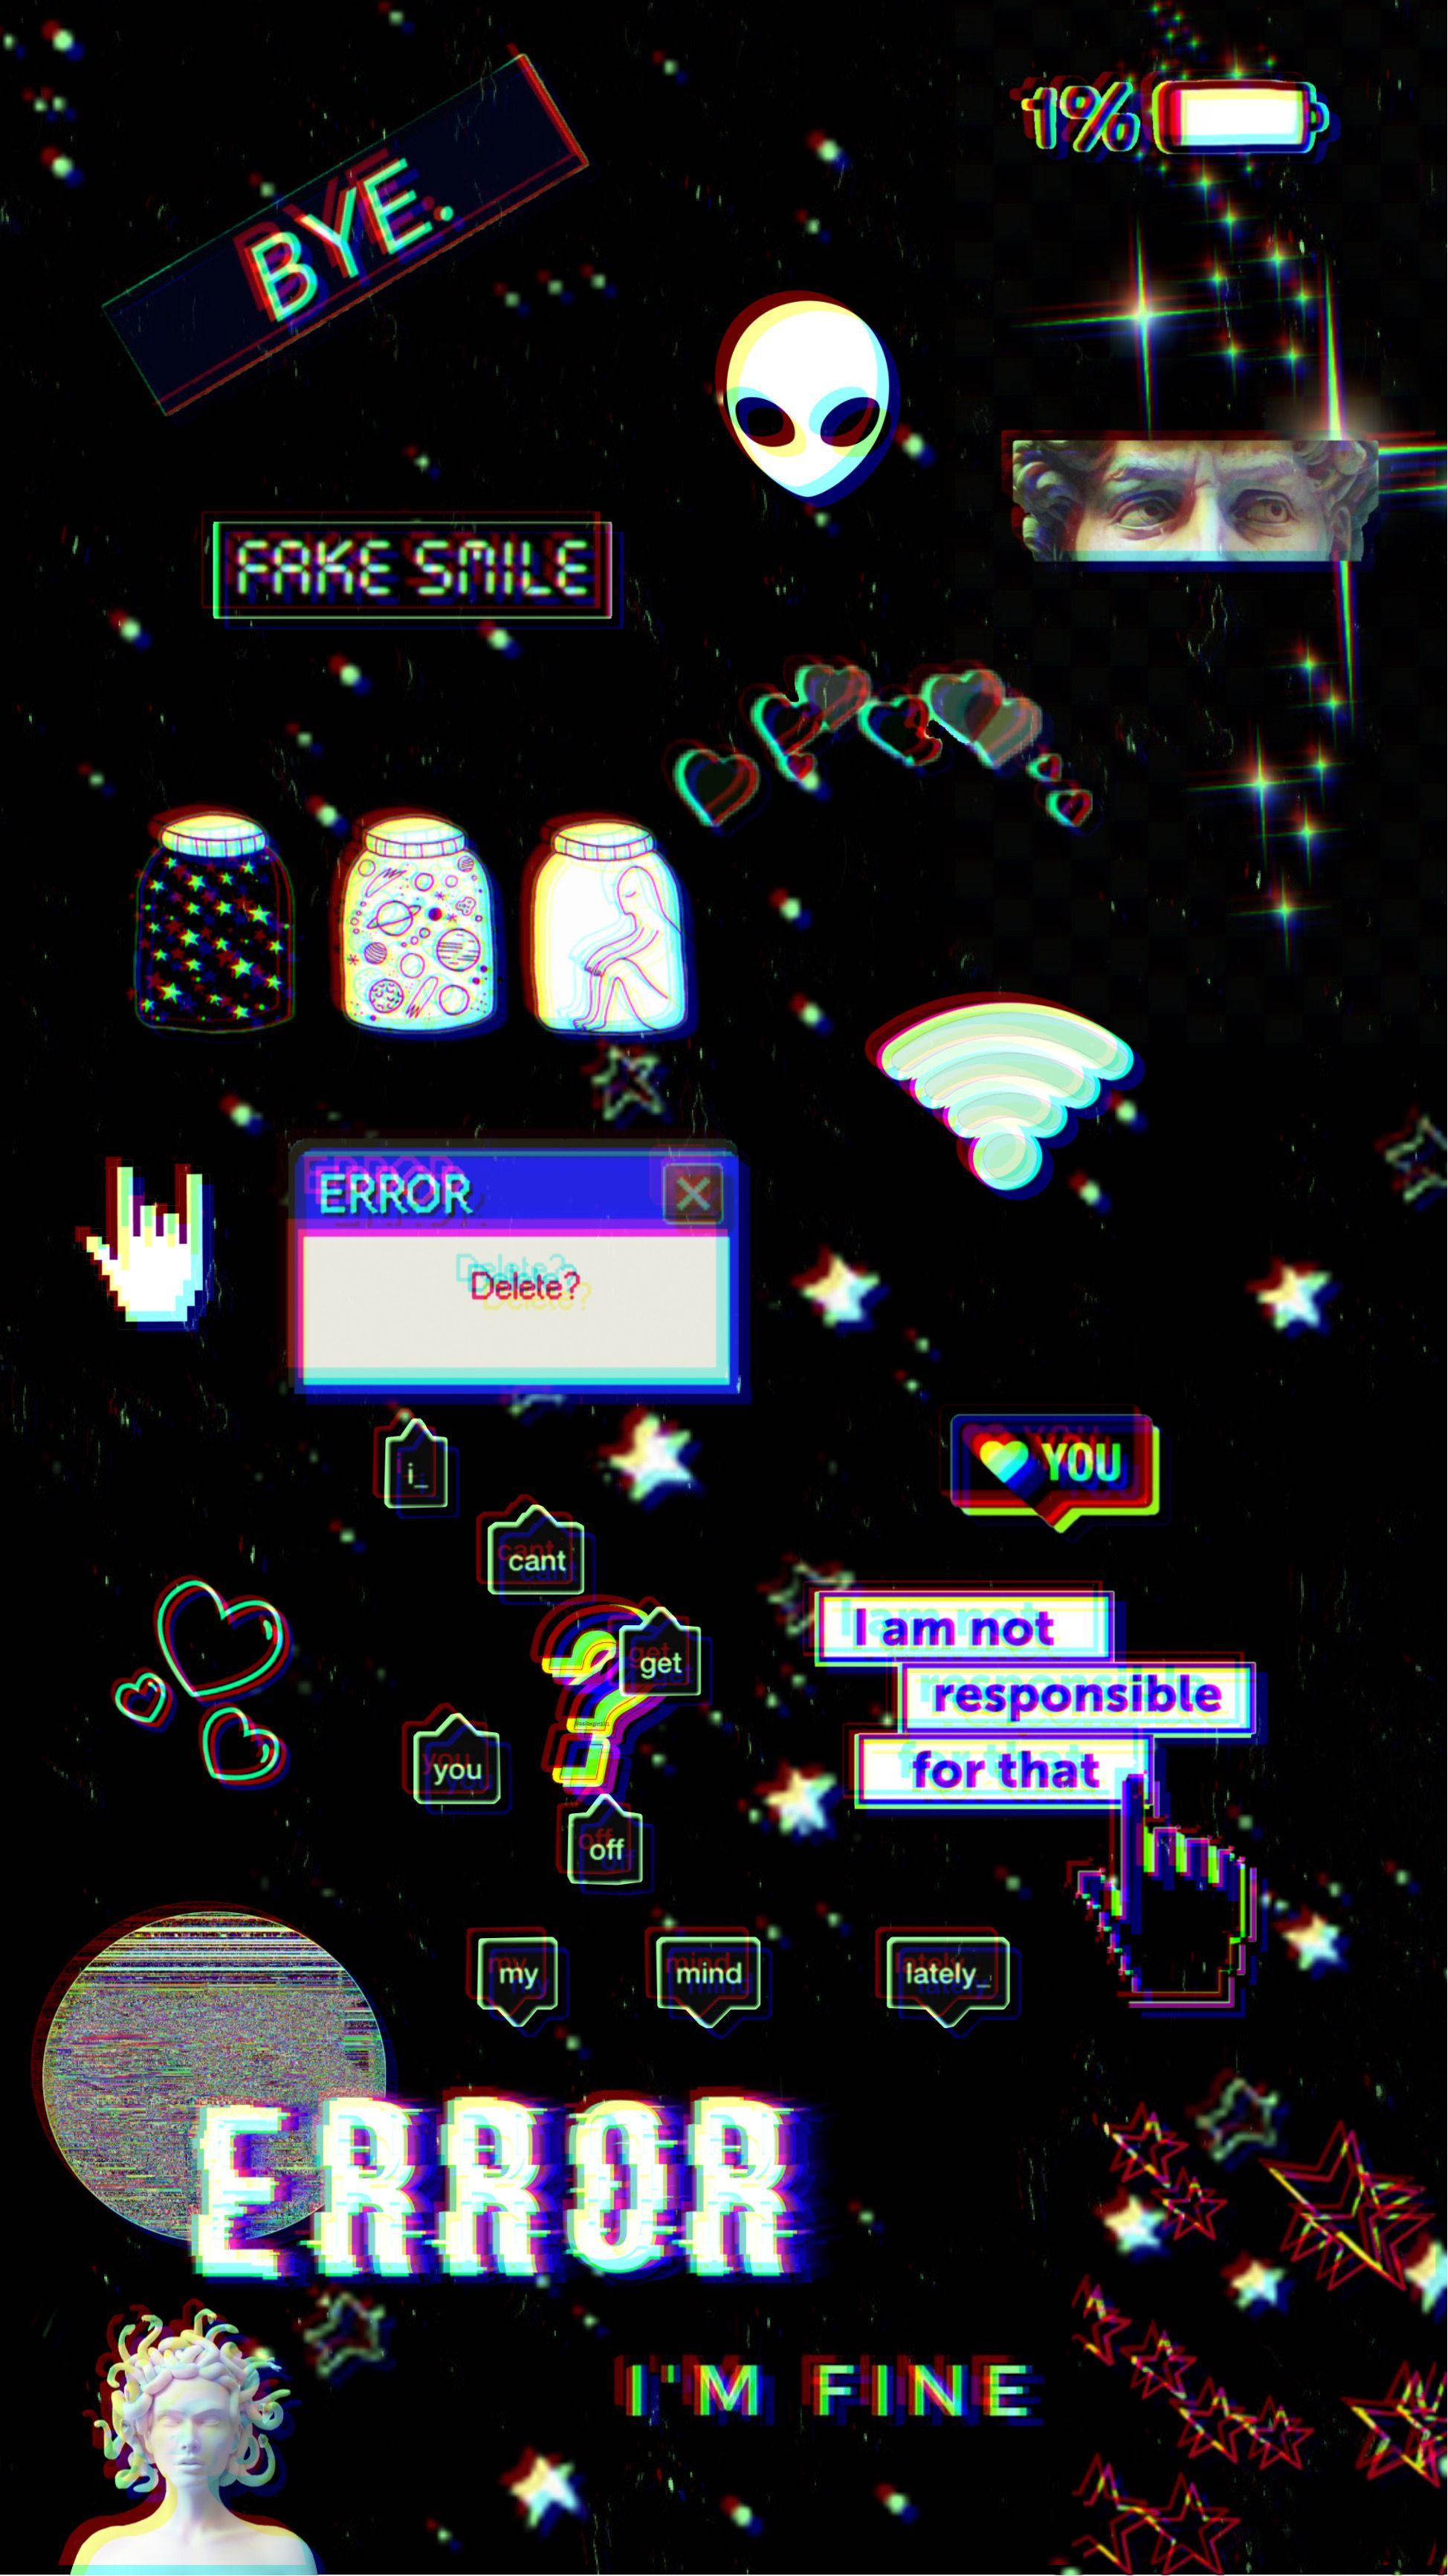 Messy Glitch Phone Wallpaper #MadeWithPicsArt